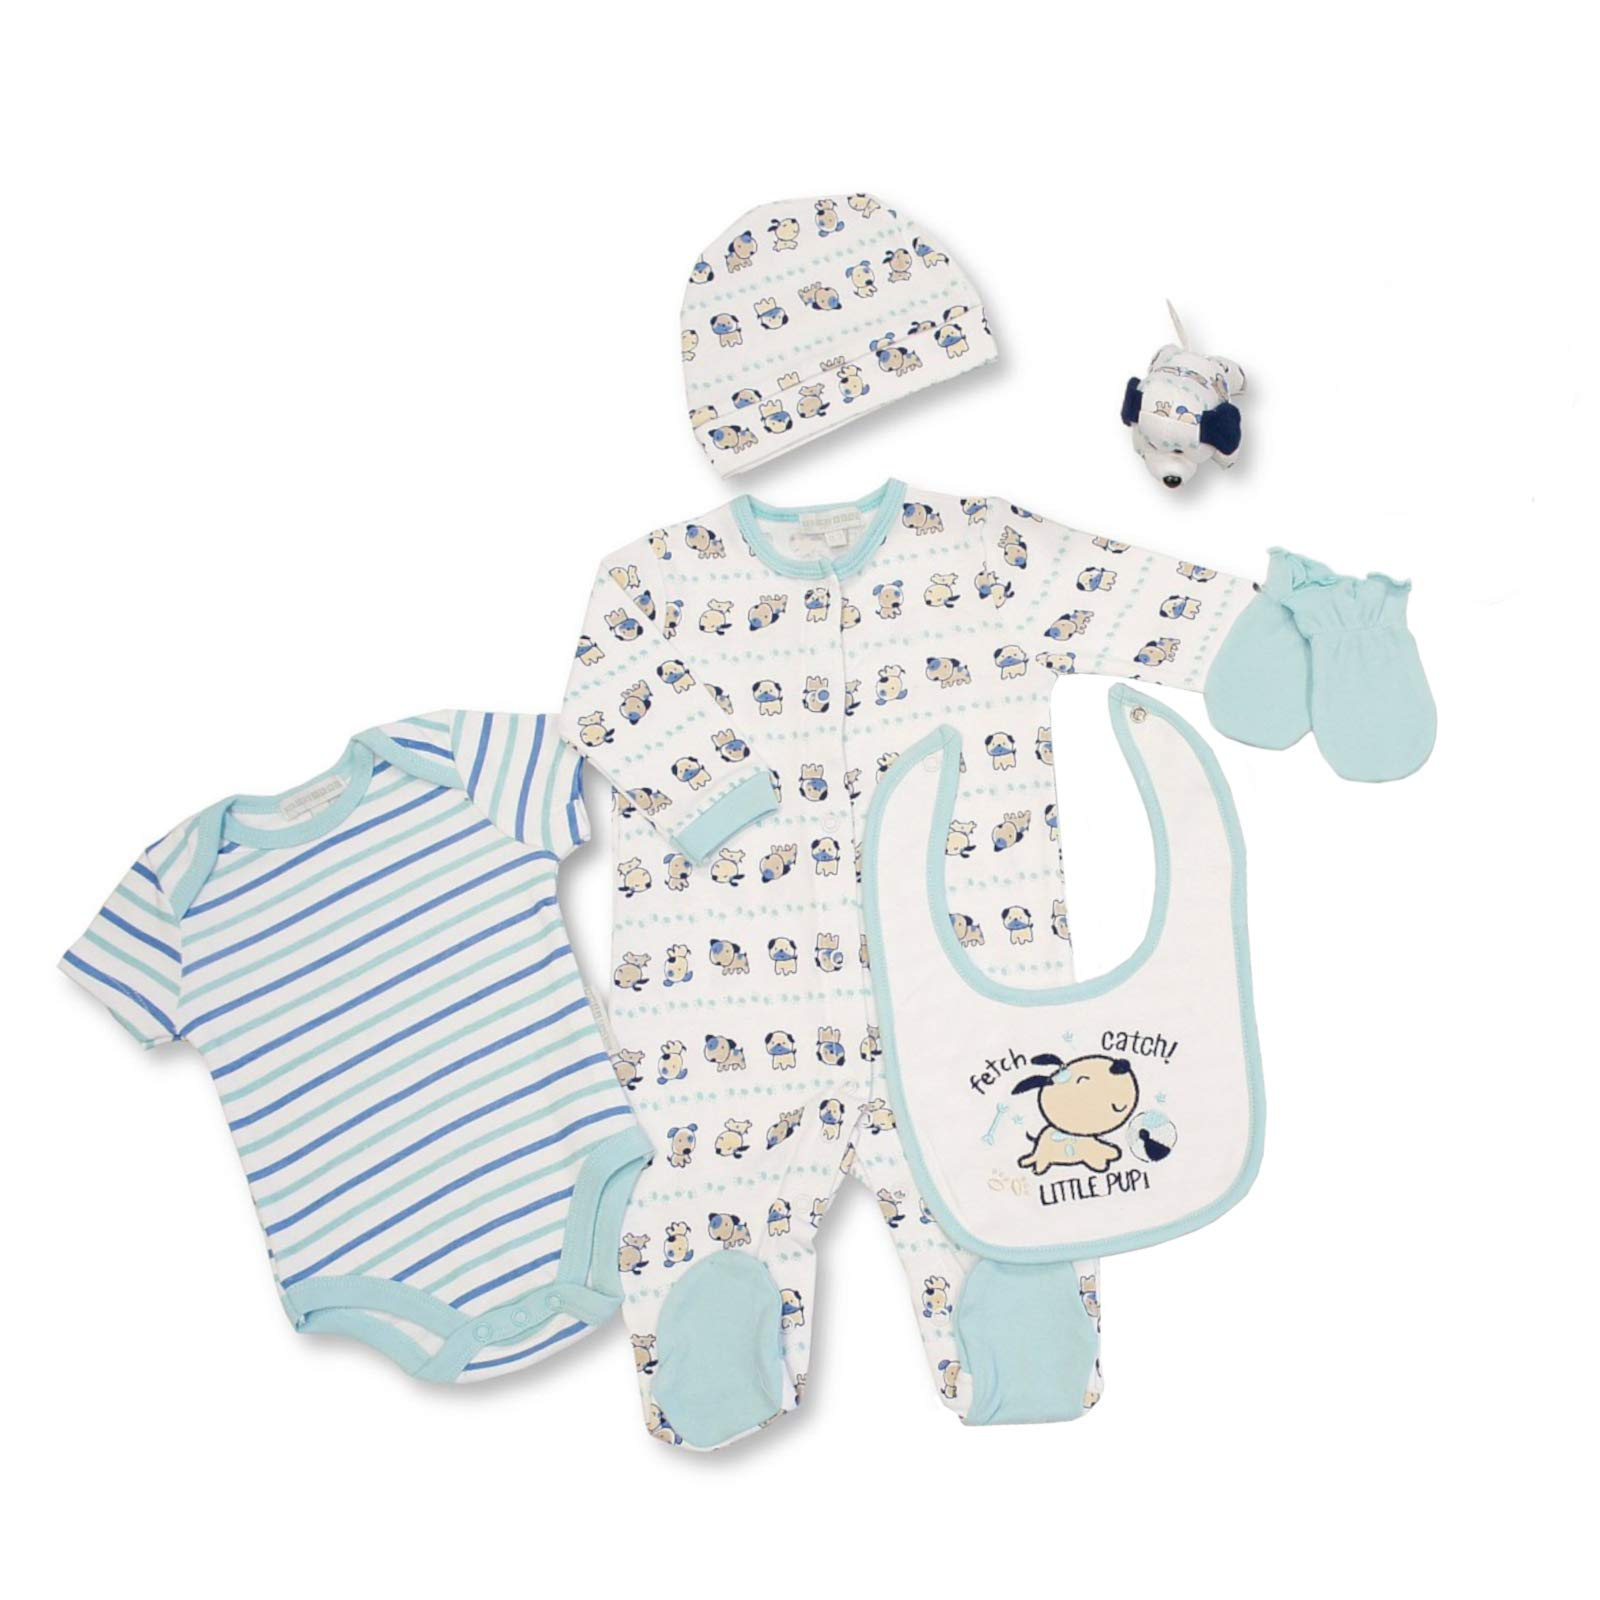 Hat and Bib Boys or Girls Cotton Sleepsuit Bodysuit Baby Layette Set Gift Set